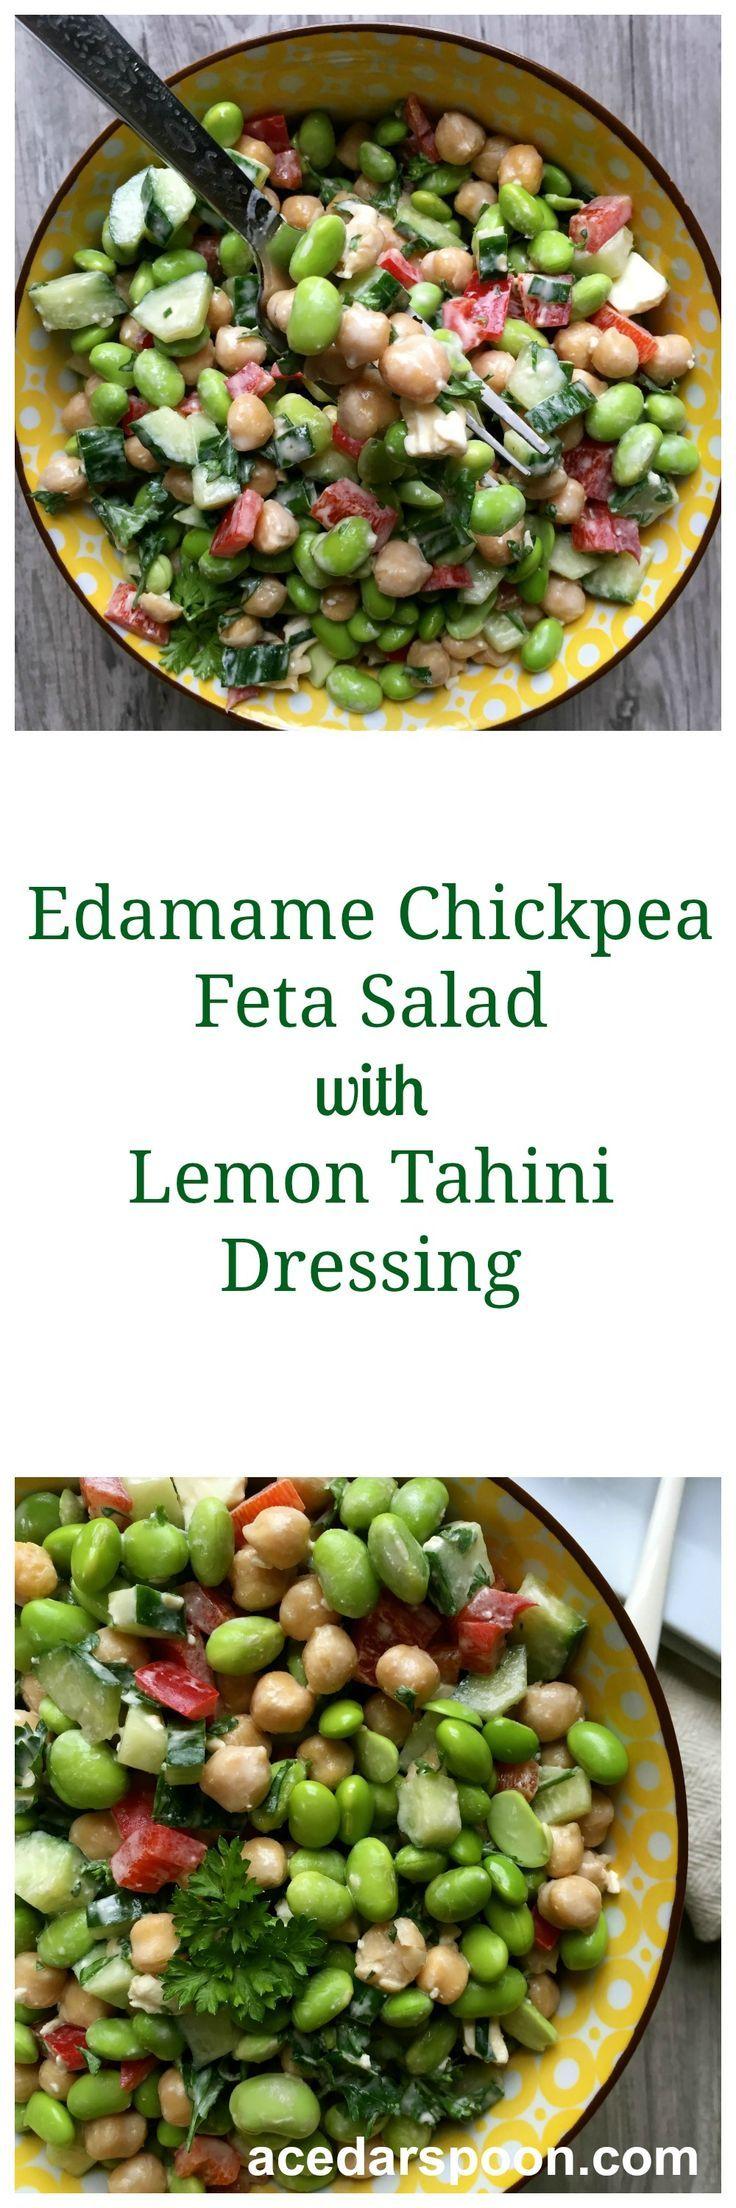 Edamame Chickpea Feta Salad With Lemon Tahini Dressing Is A Fresh Nutritious Salad Of Edamame